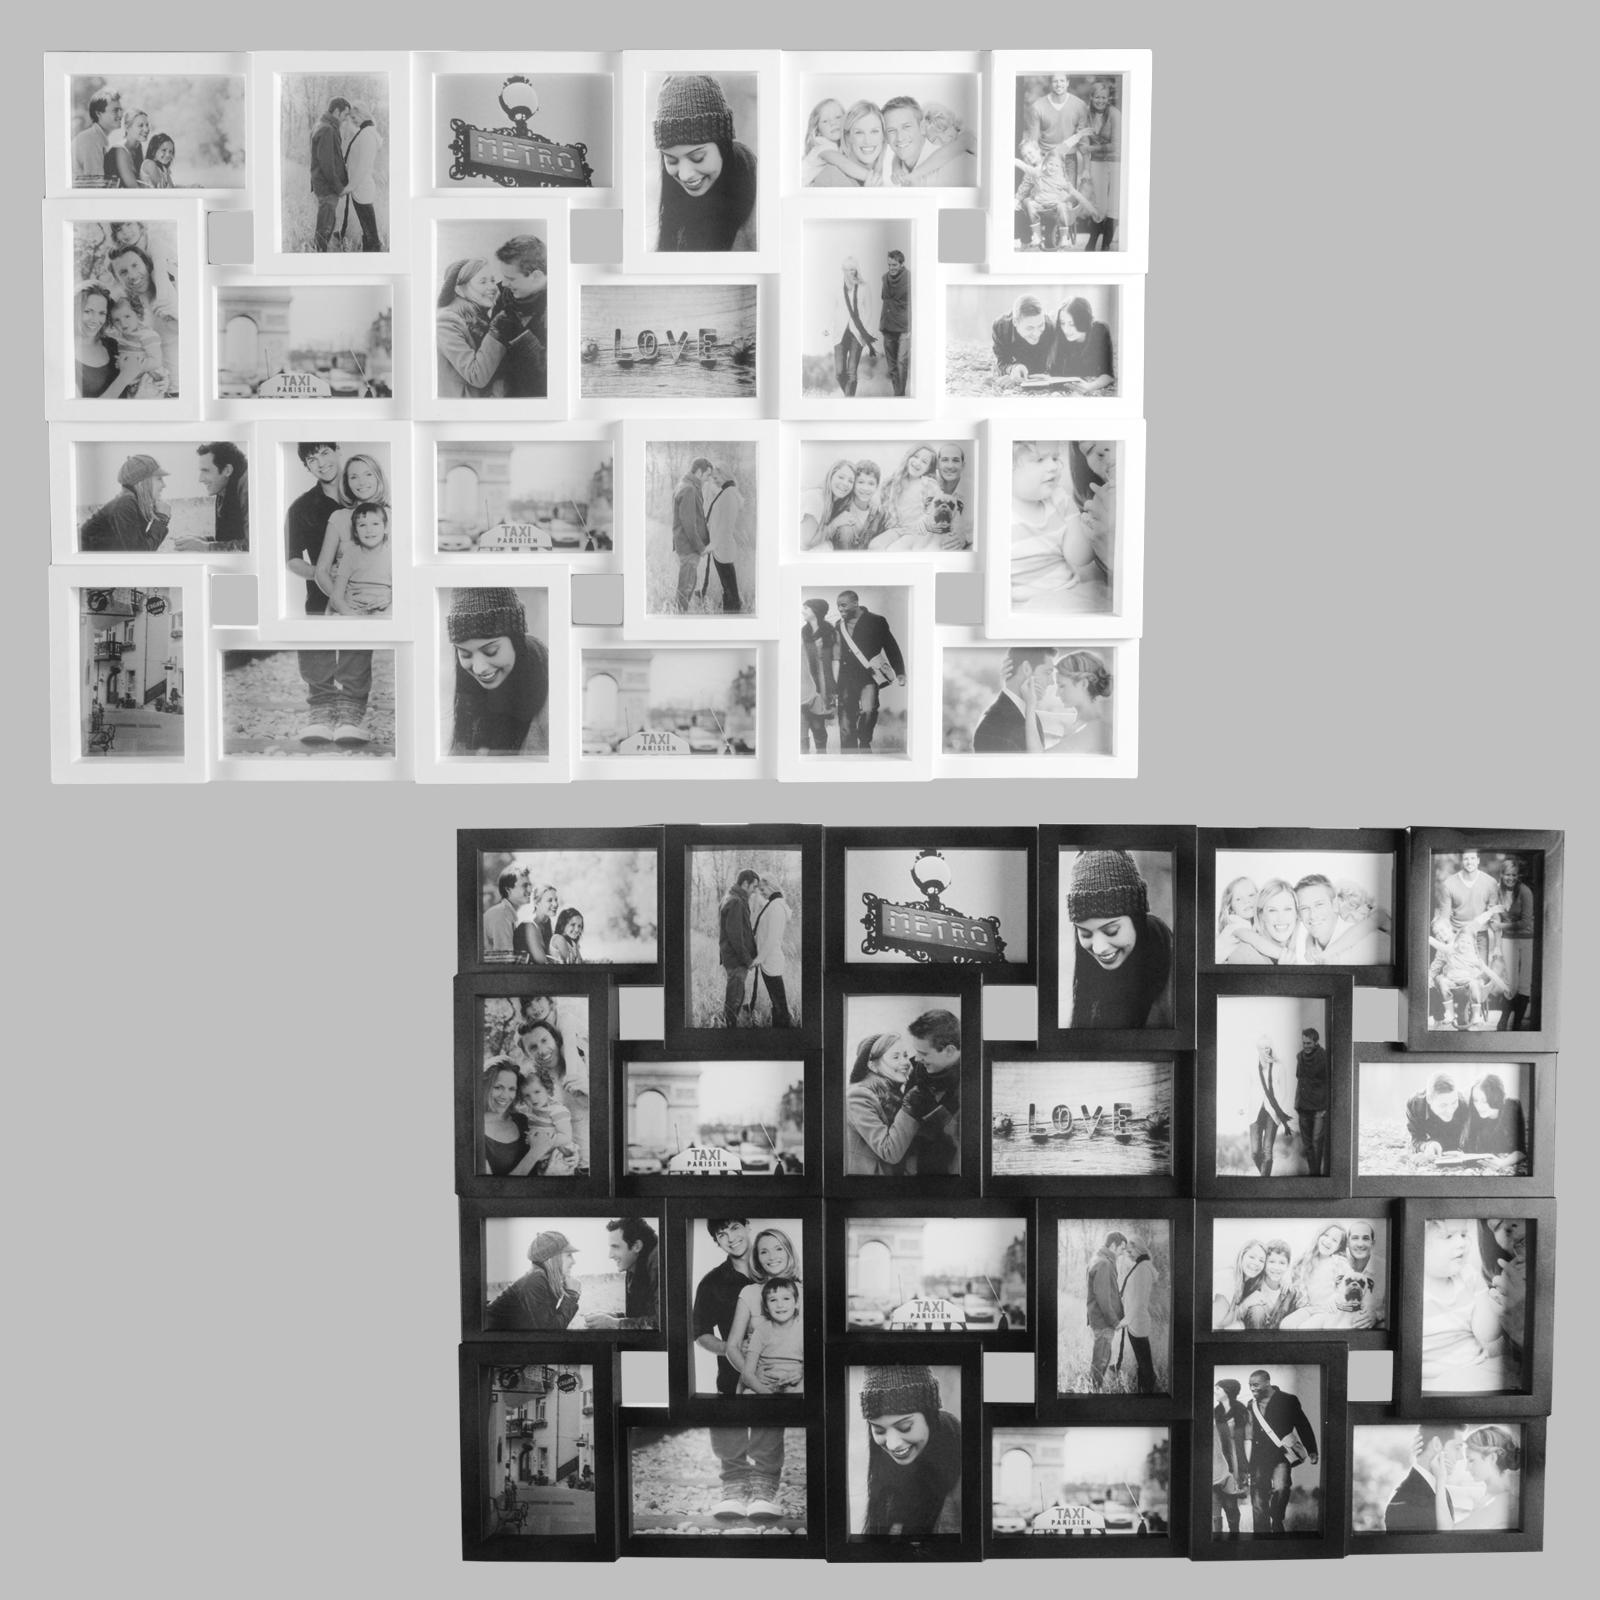 24 fotos bilderrahmen fotorahmen fotocollage collage fotogalerie bildergalerie ebay. Black Bedroom Furniture Sets. Home Design Ideas